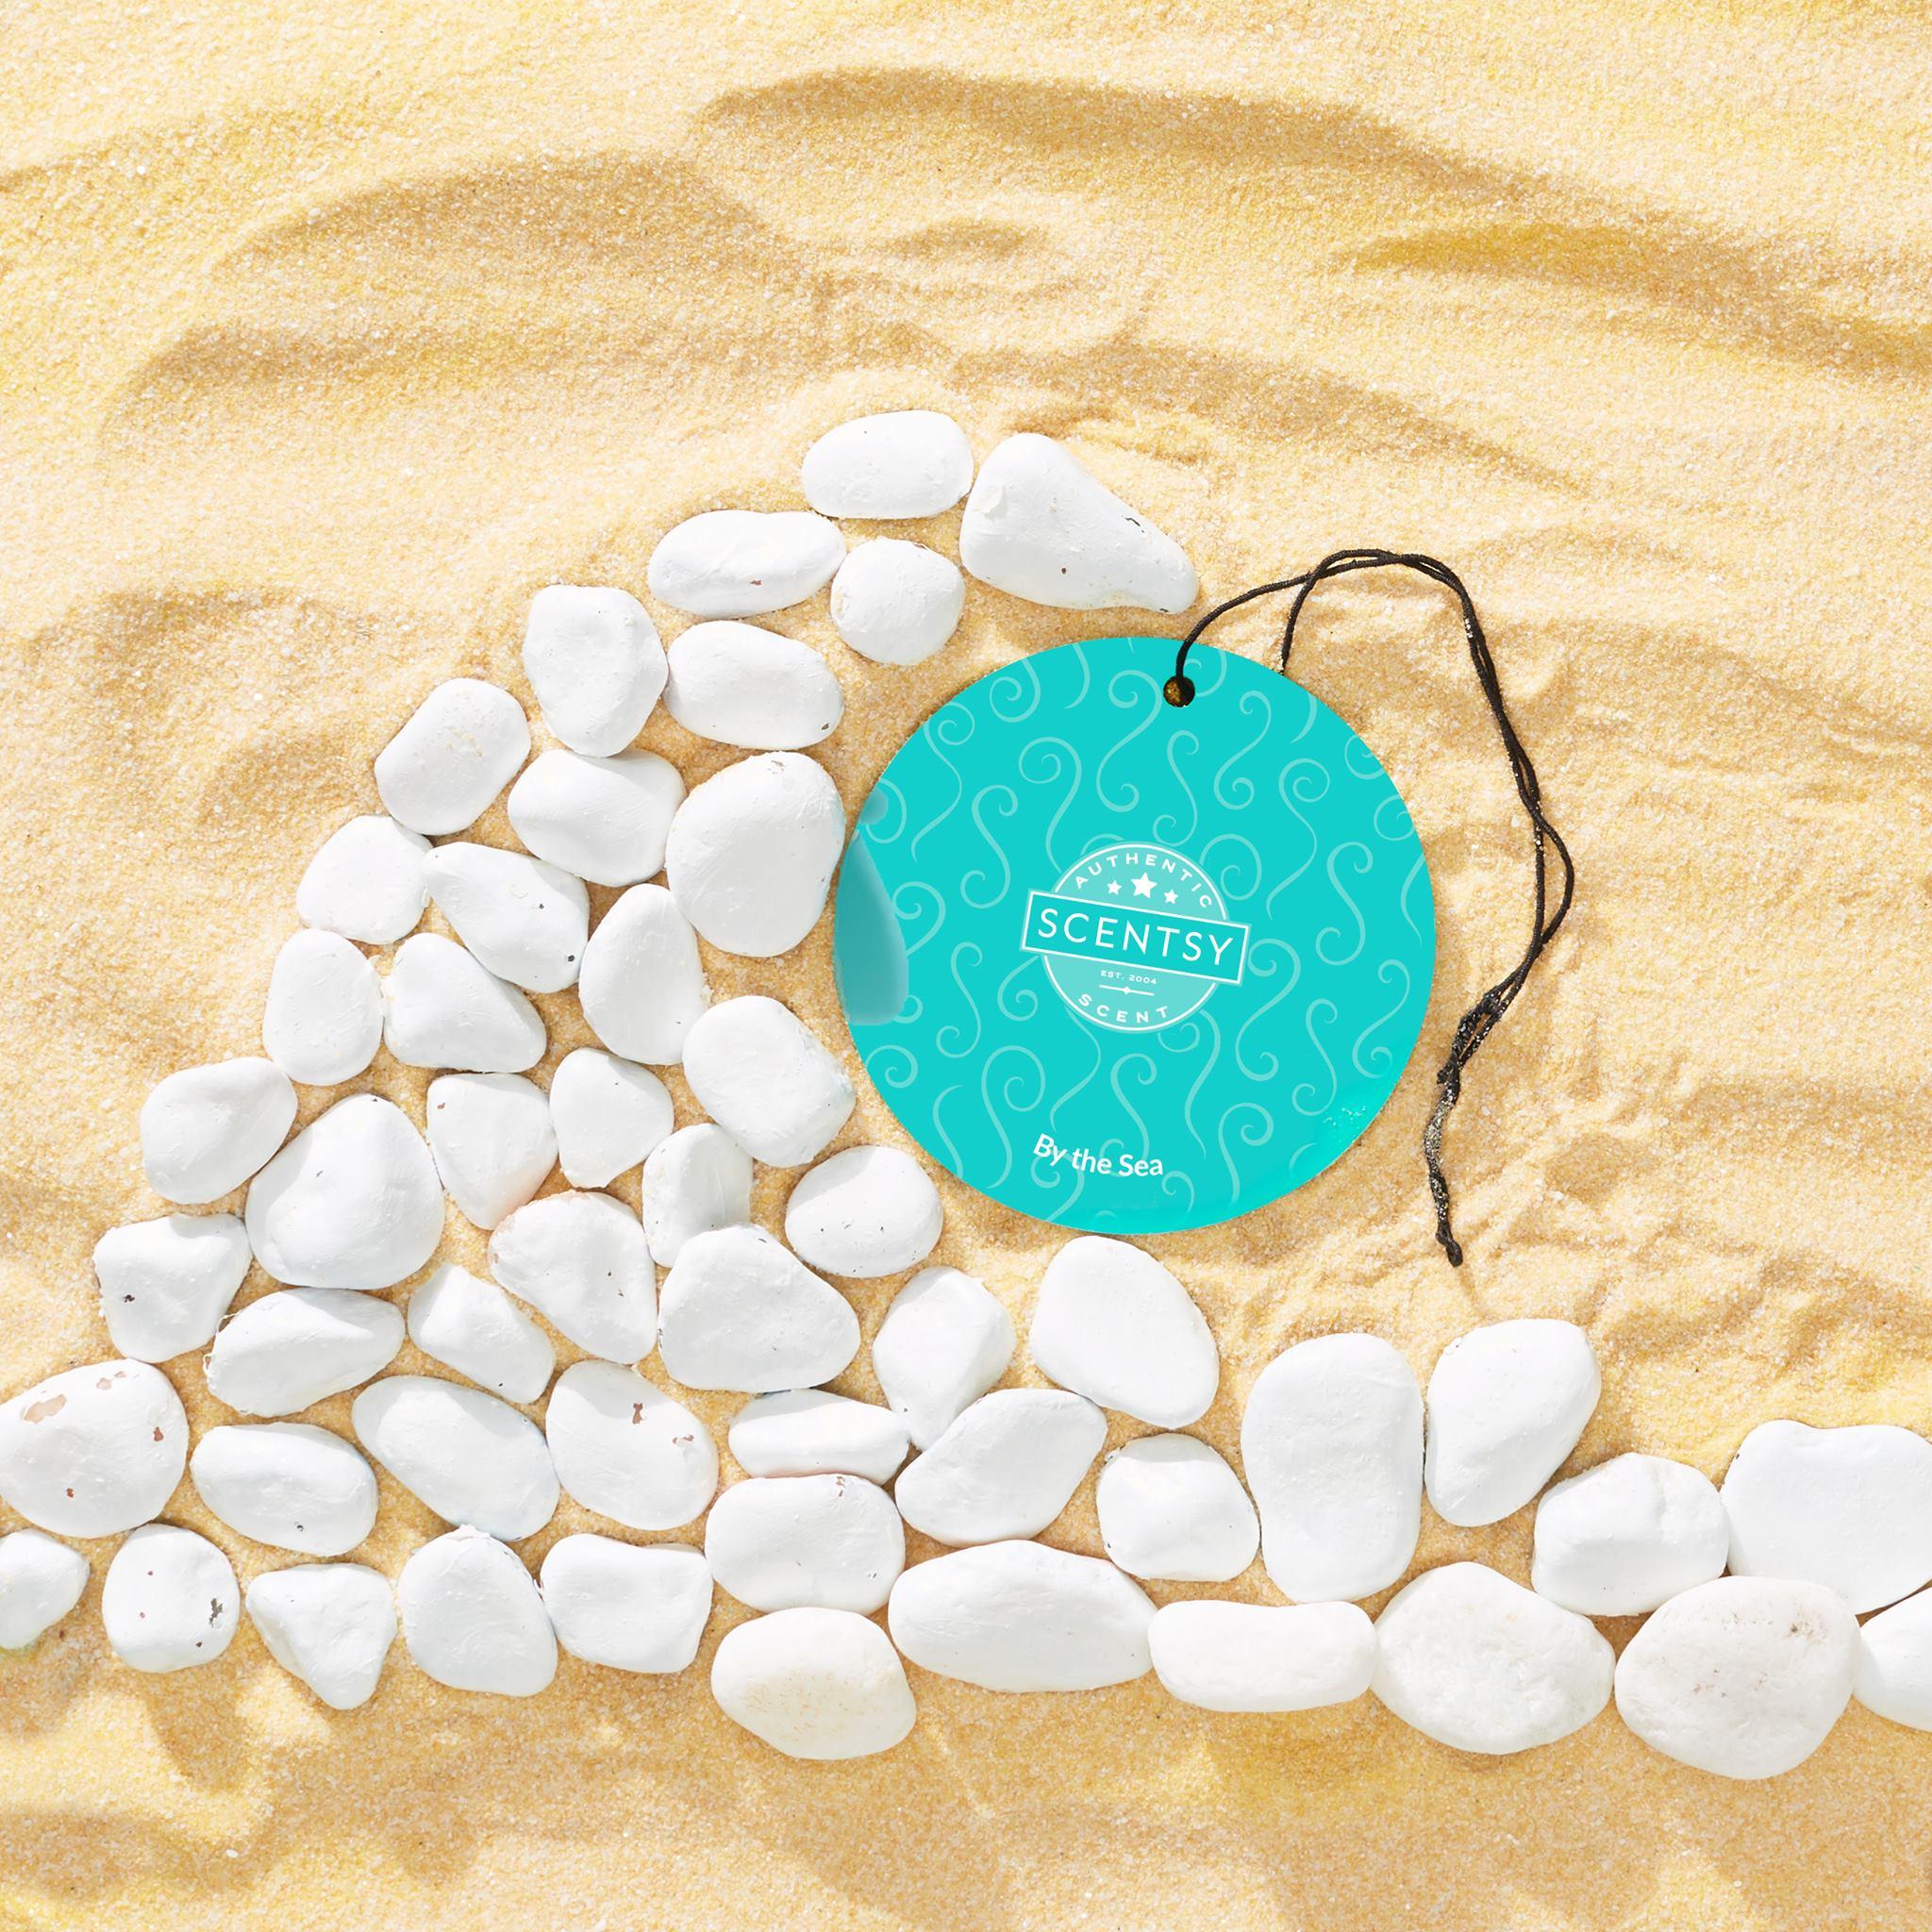 By the Sea Scent Circle Nissa Rinald